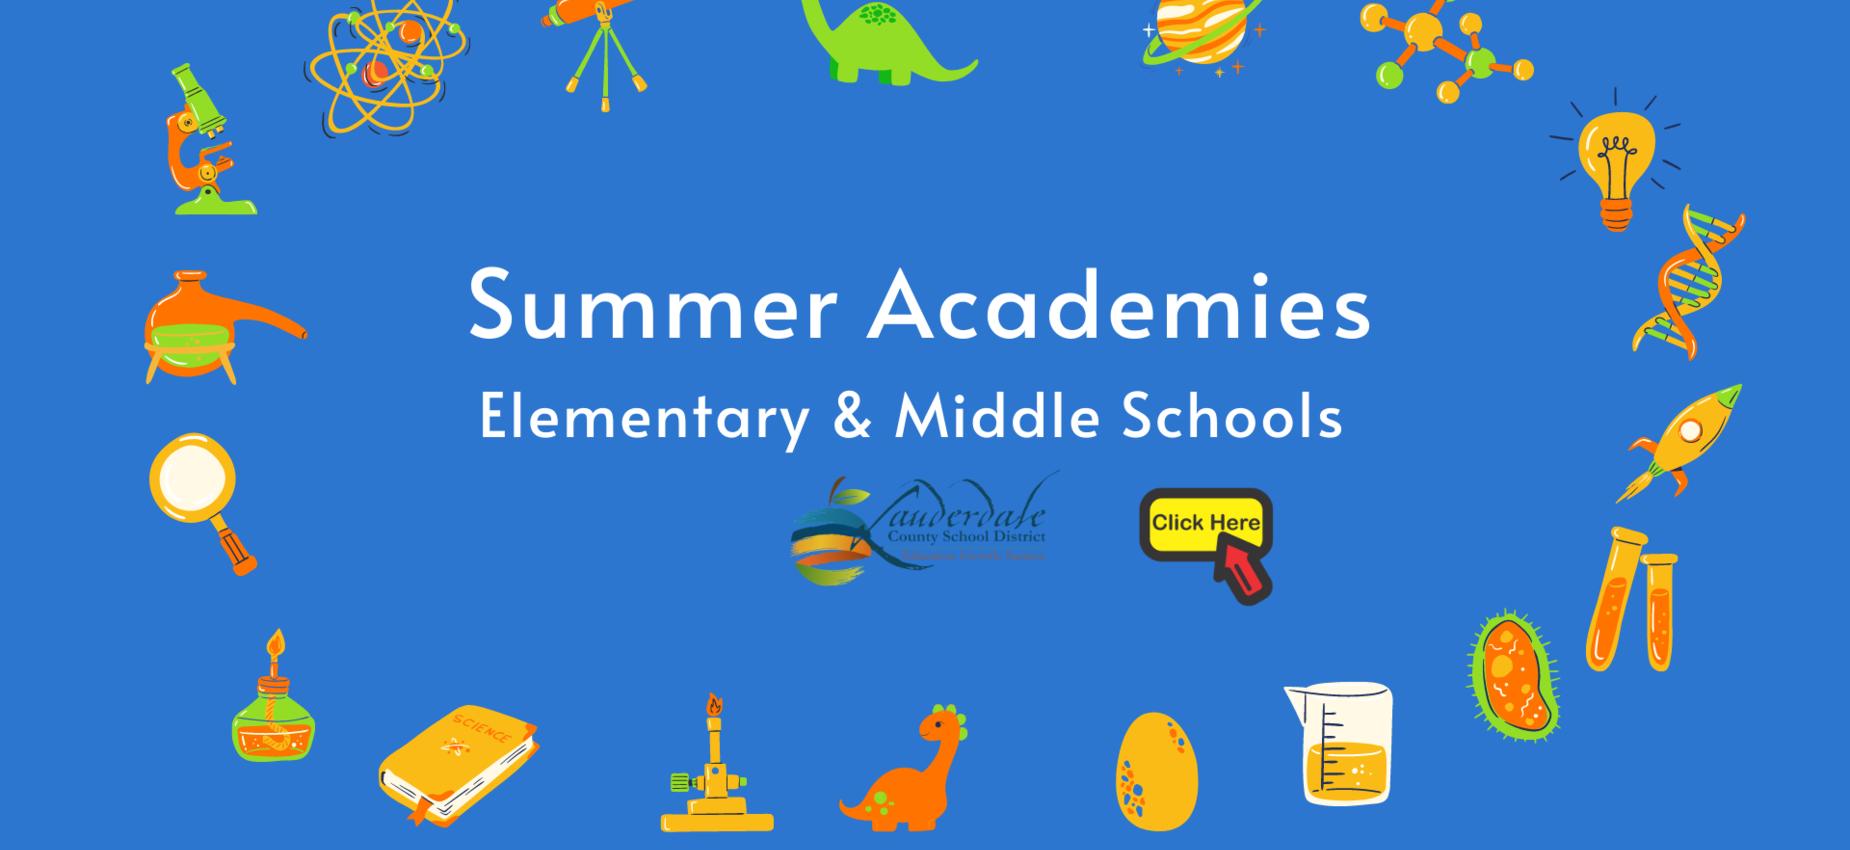 LCSD Summer Academies